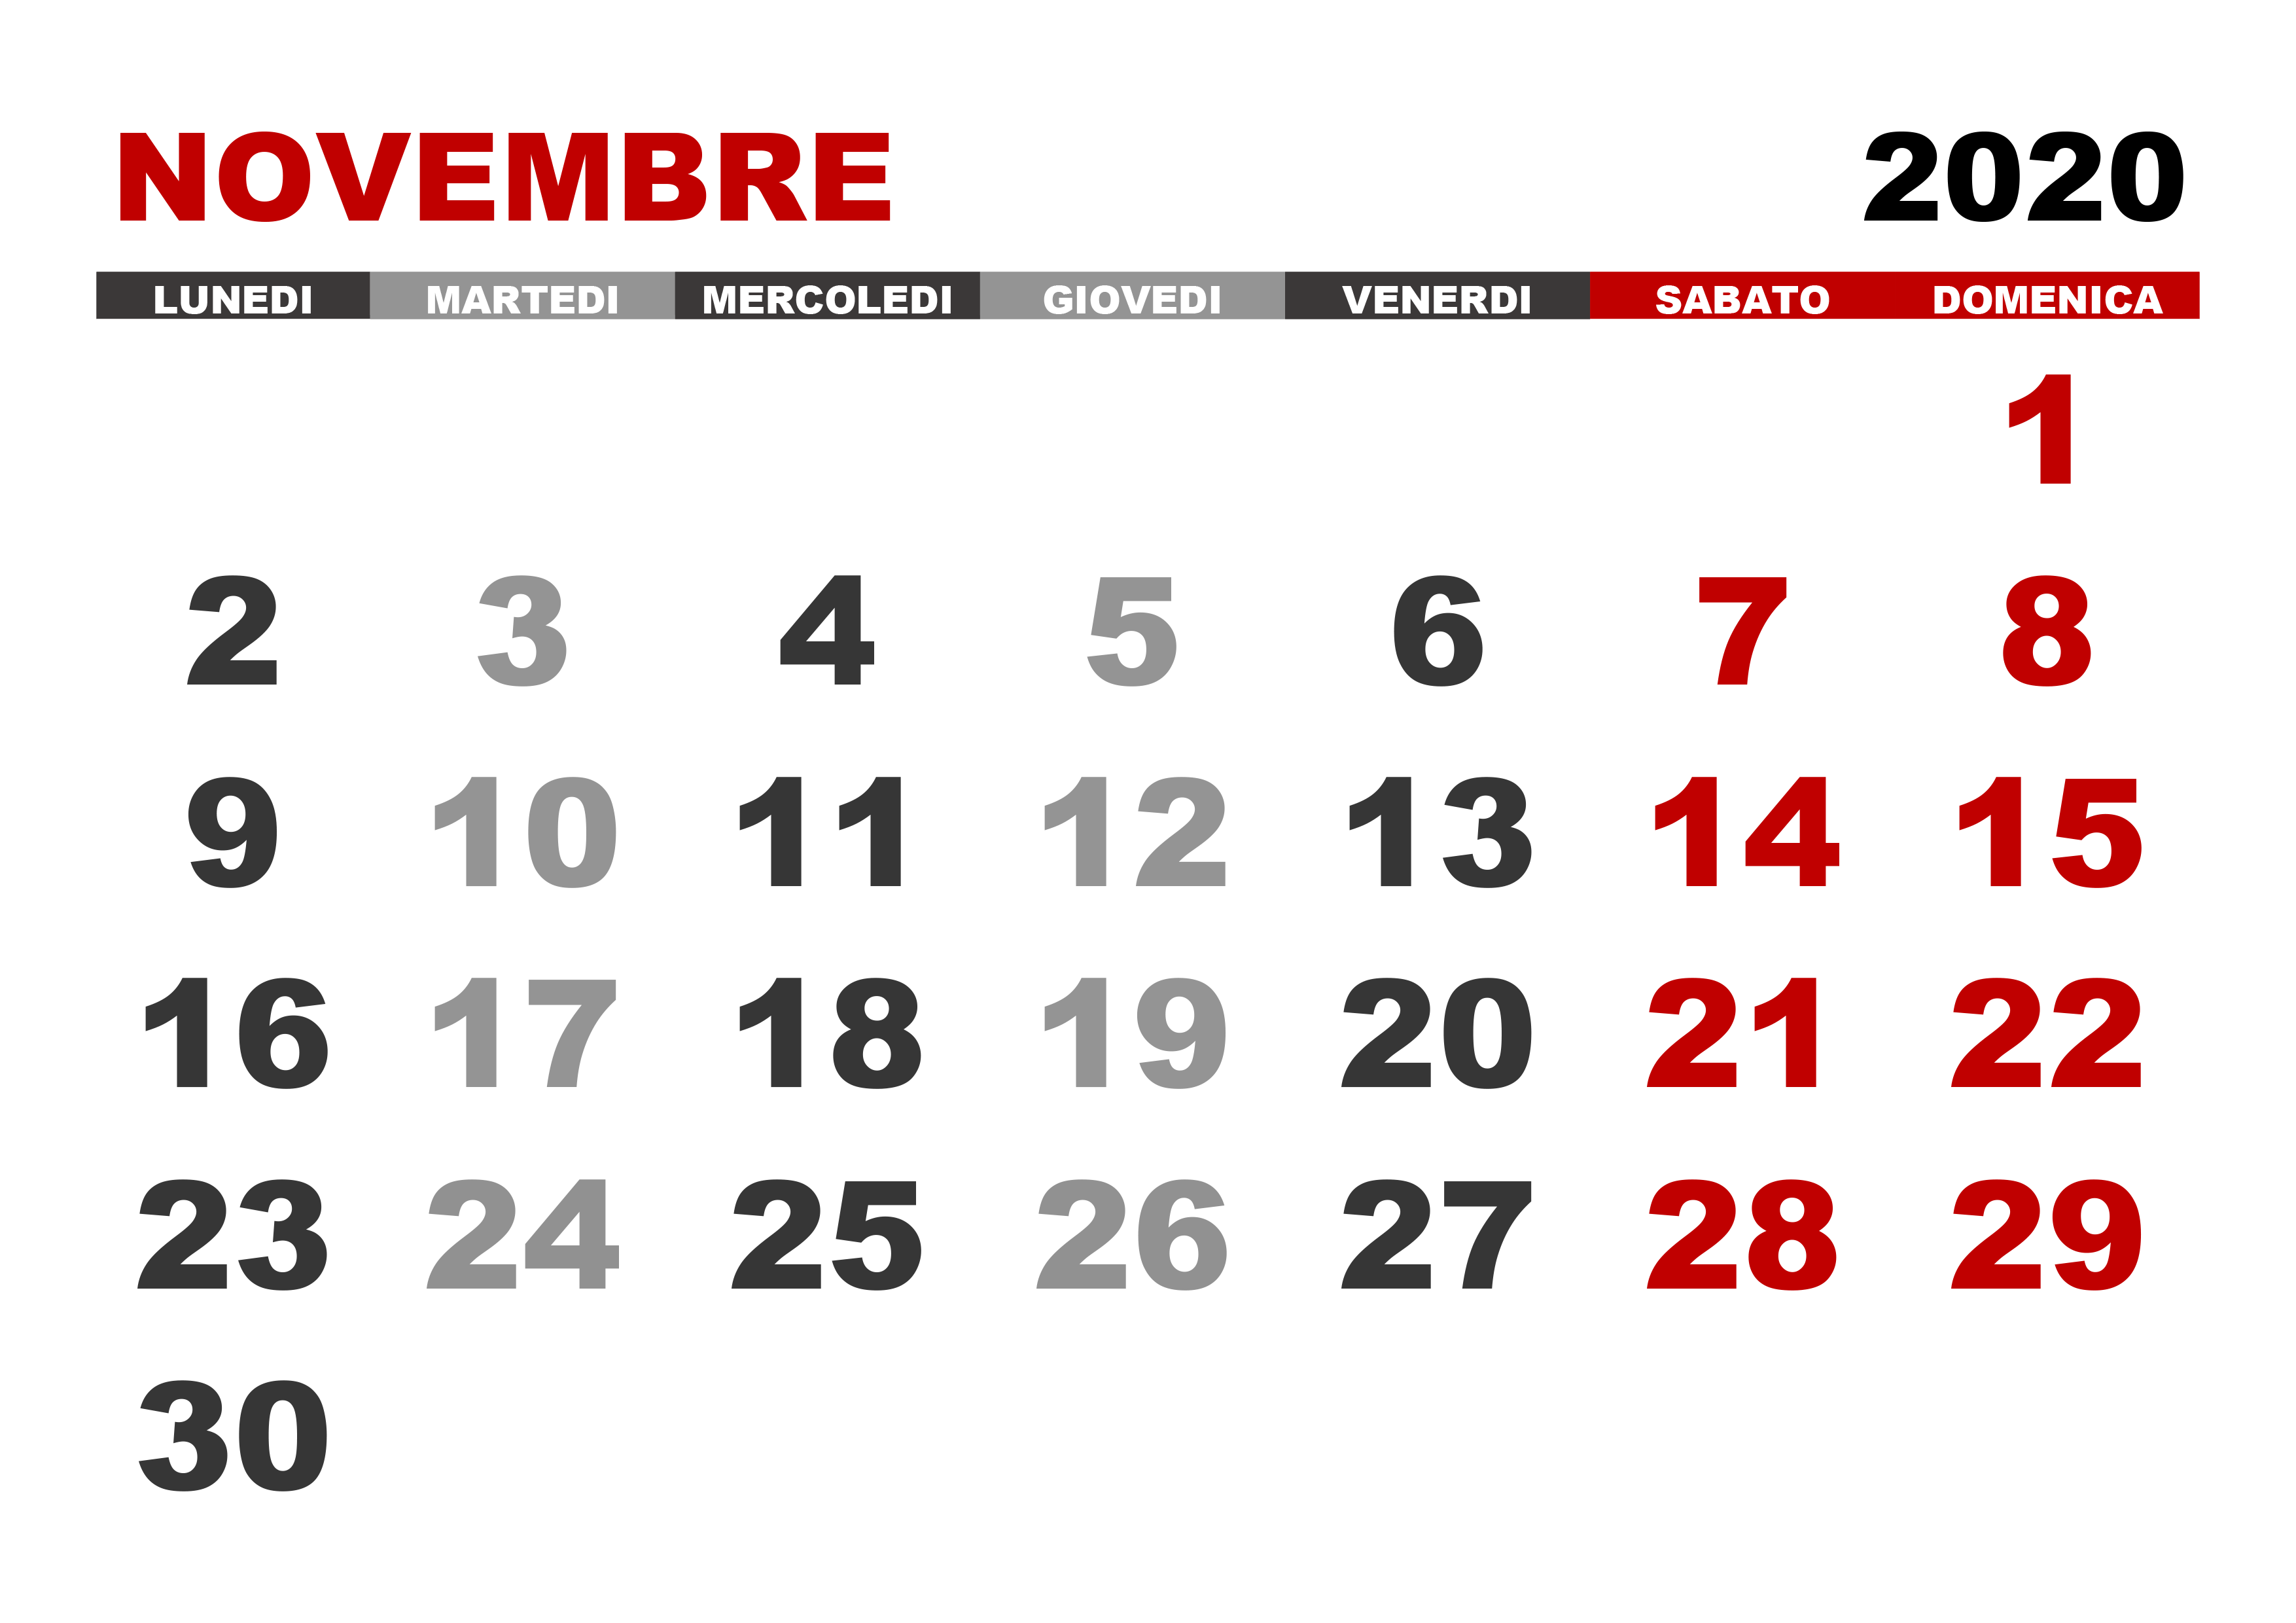 Novembre 2020 Calendario.Calendario Novembre 2020 Calendario Su